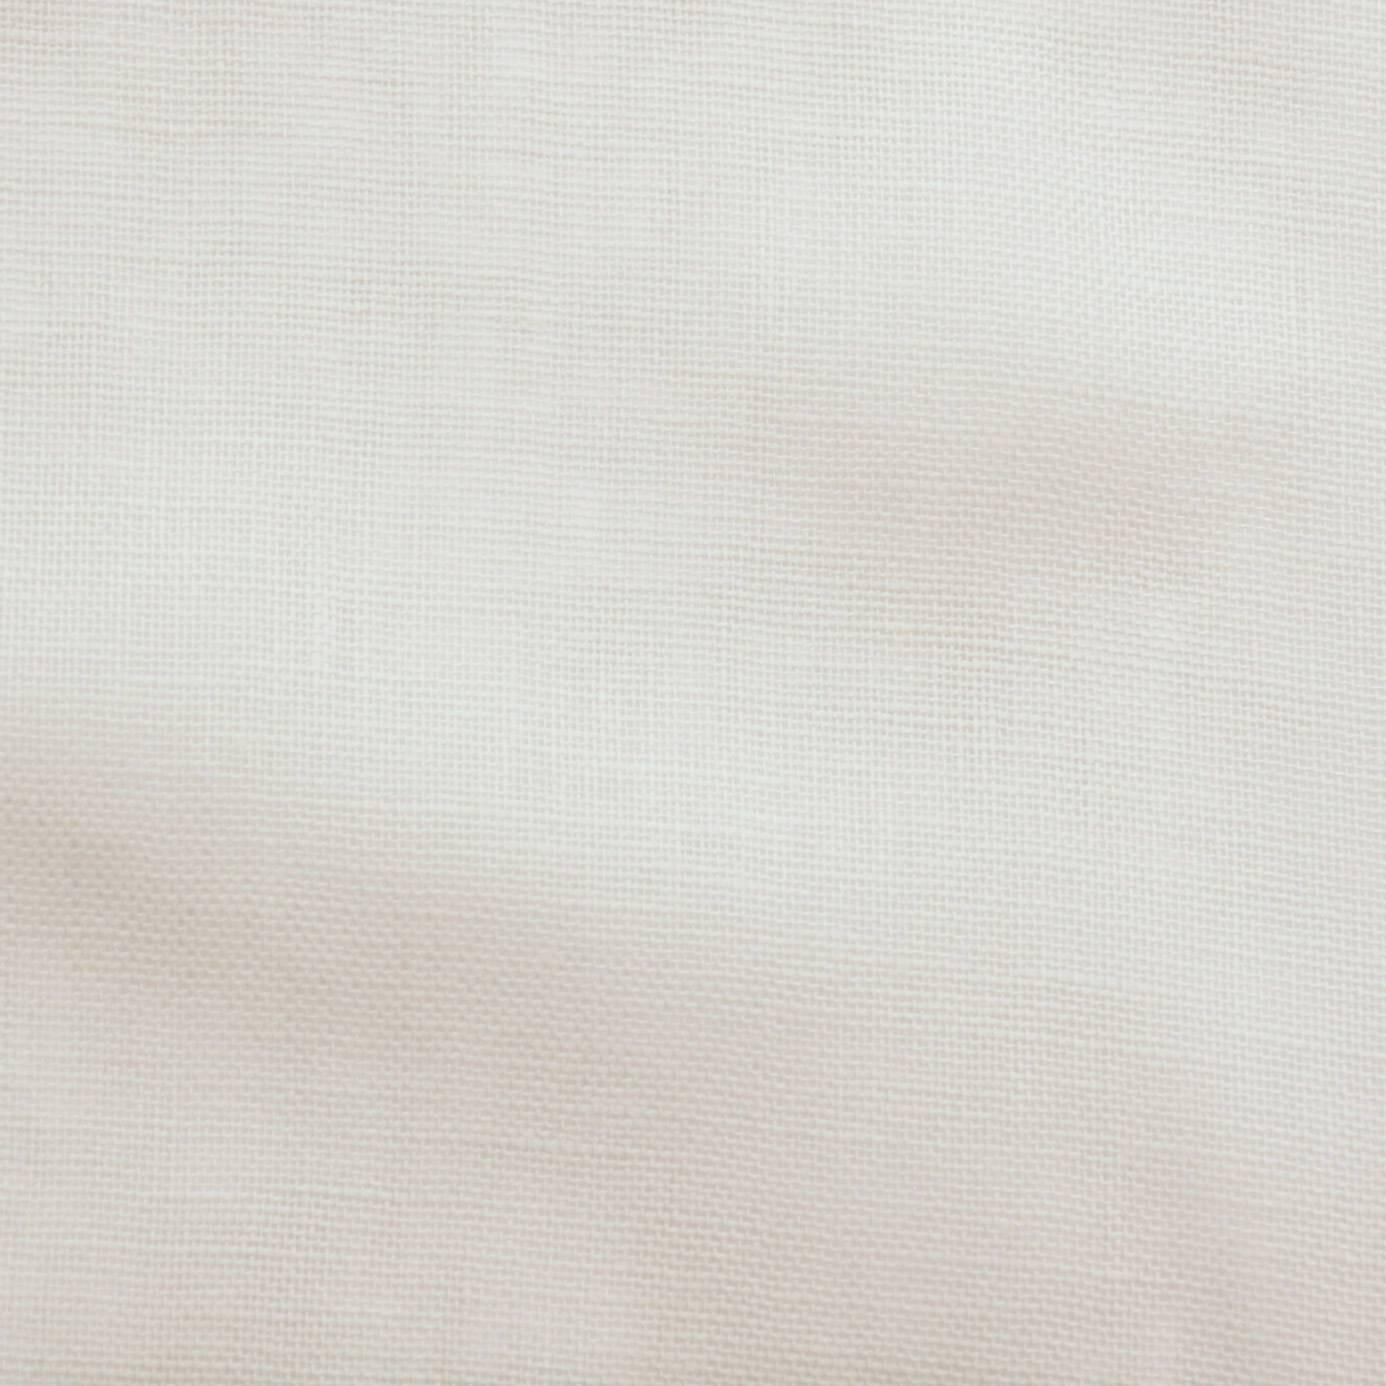 Lightweight Sheers Fabric Silver 243331 Sanderson Lightweight Sheers Fabric Collection